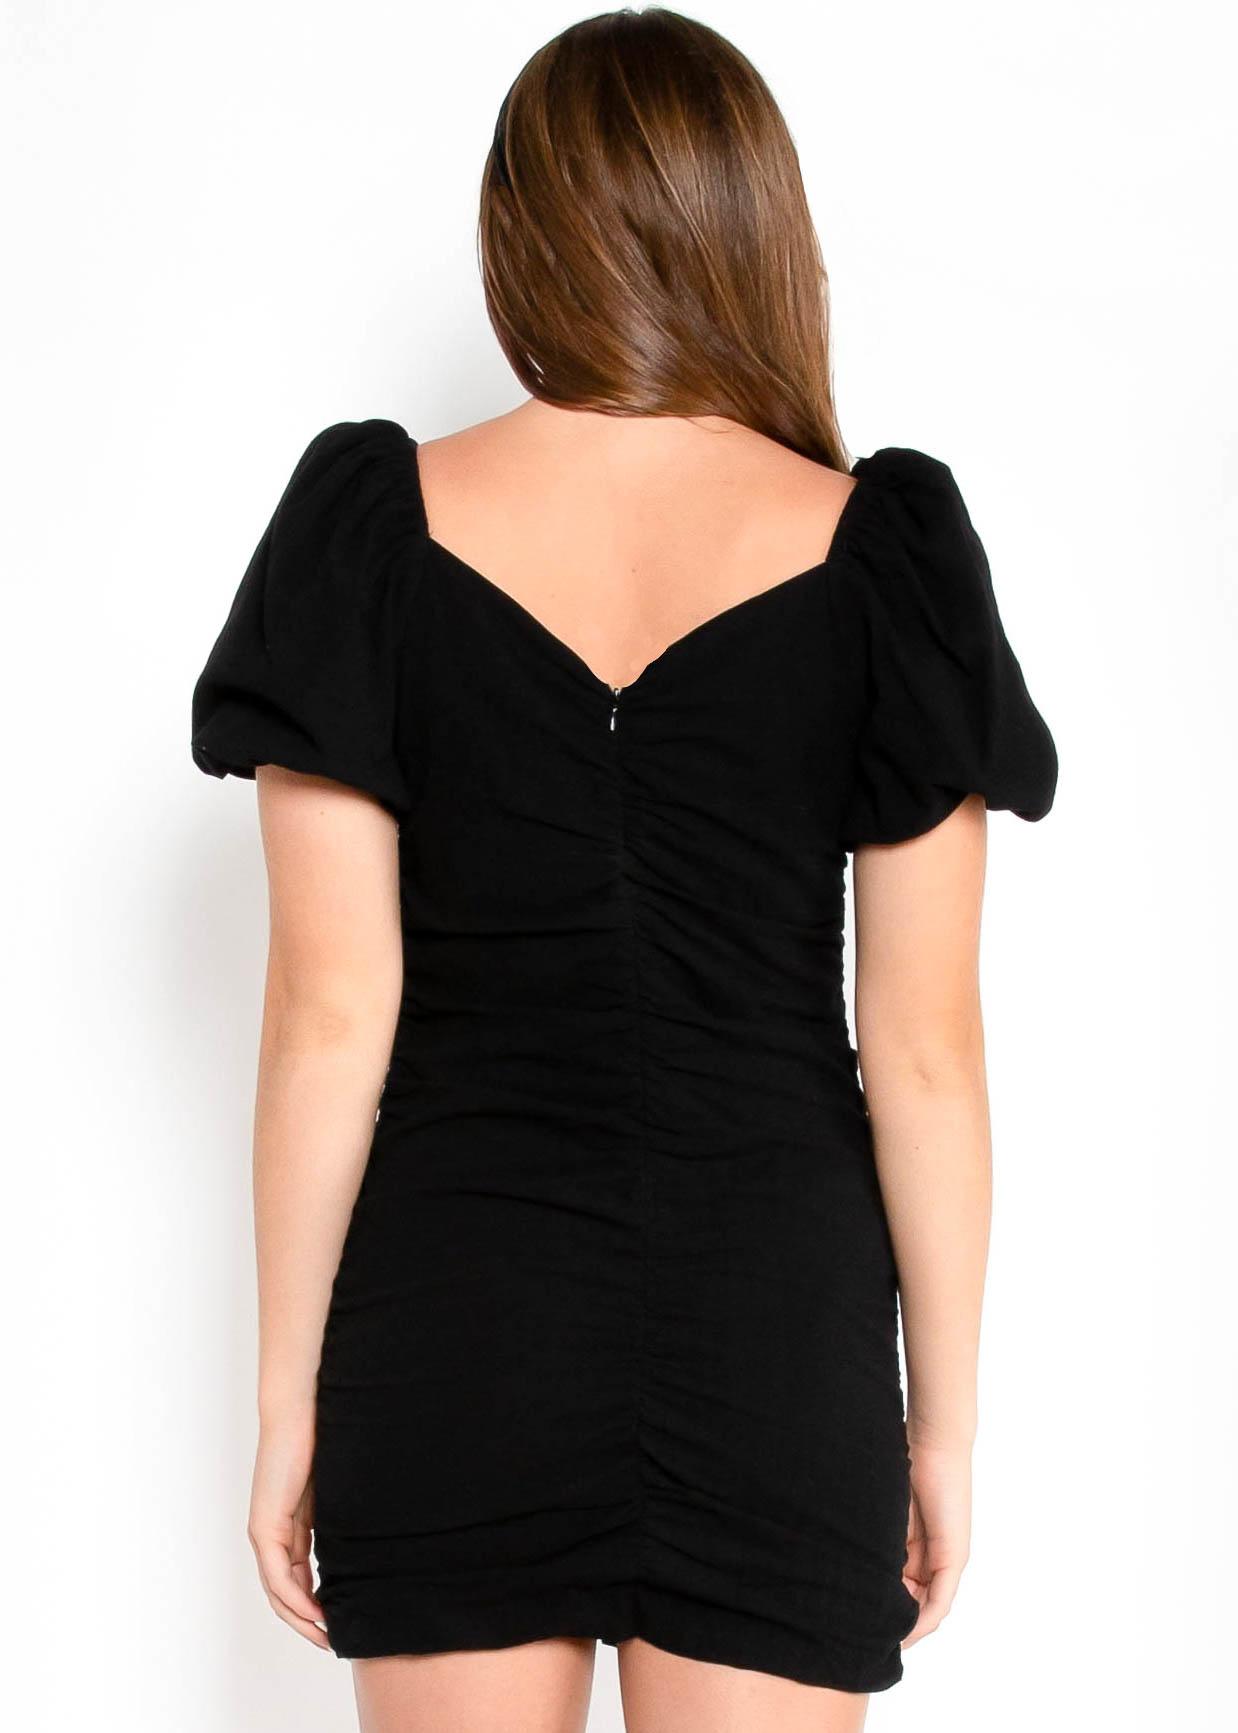 LOVESTRUCK BLACK BODYCON DRESS